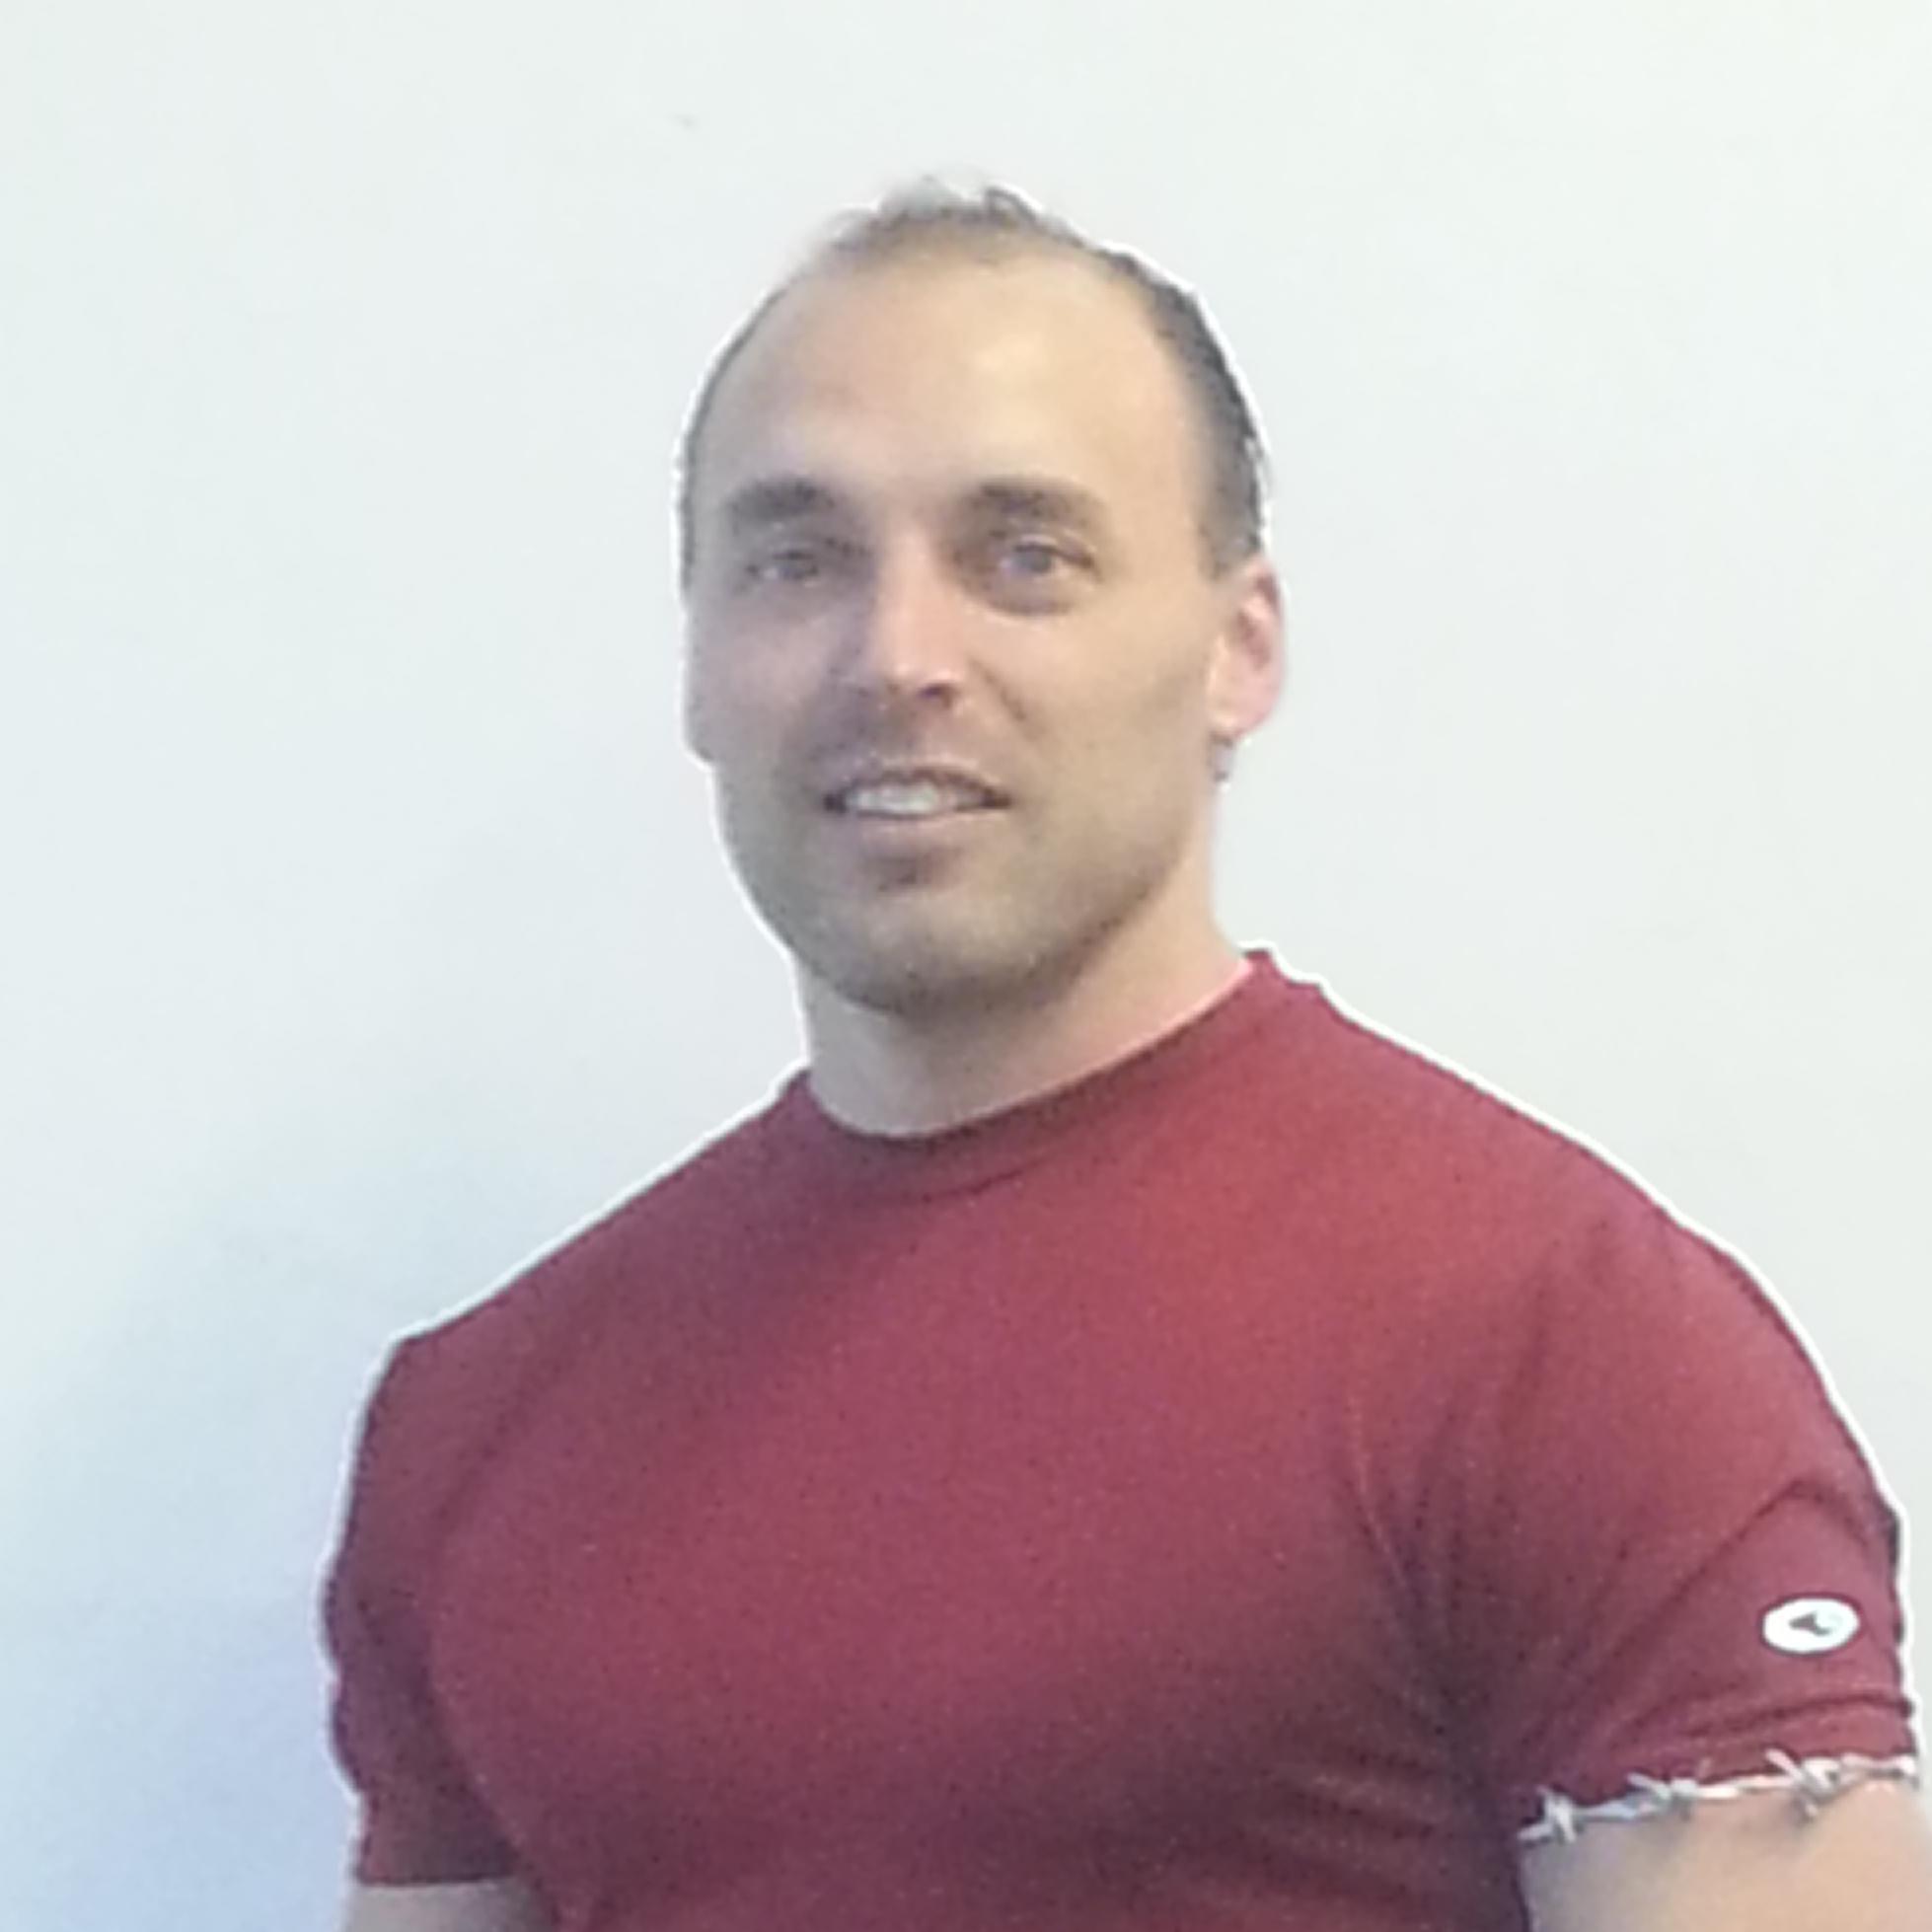 Matt Corridori